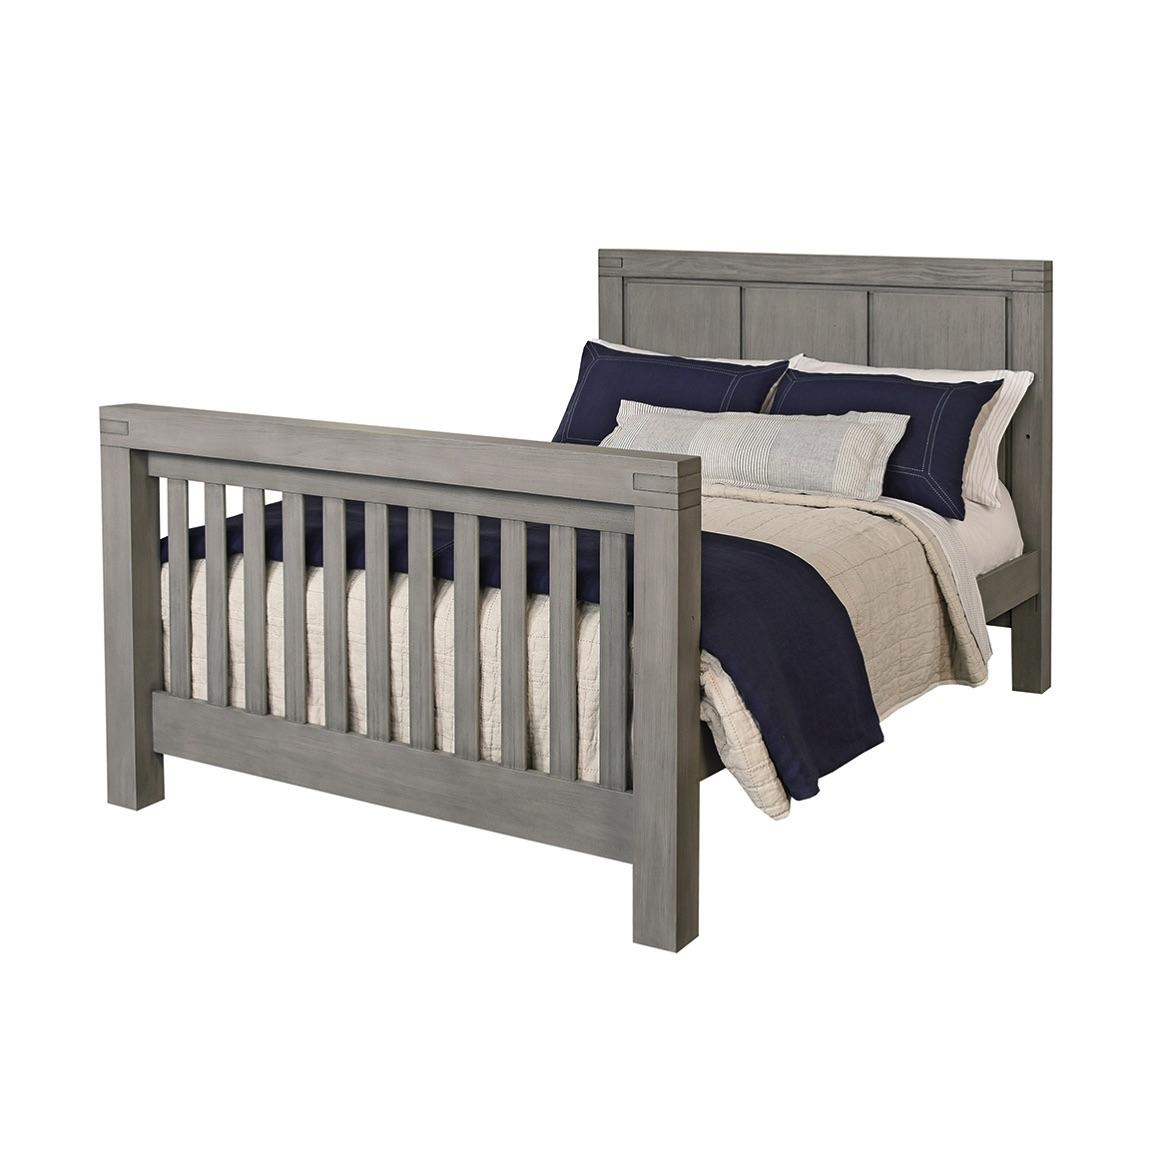 4 In 1 Convertible Crib Piermont Rustic Stonington Gray